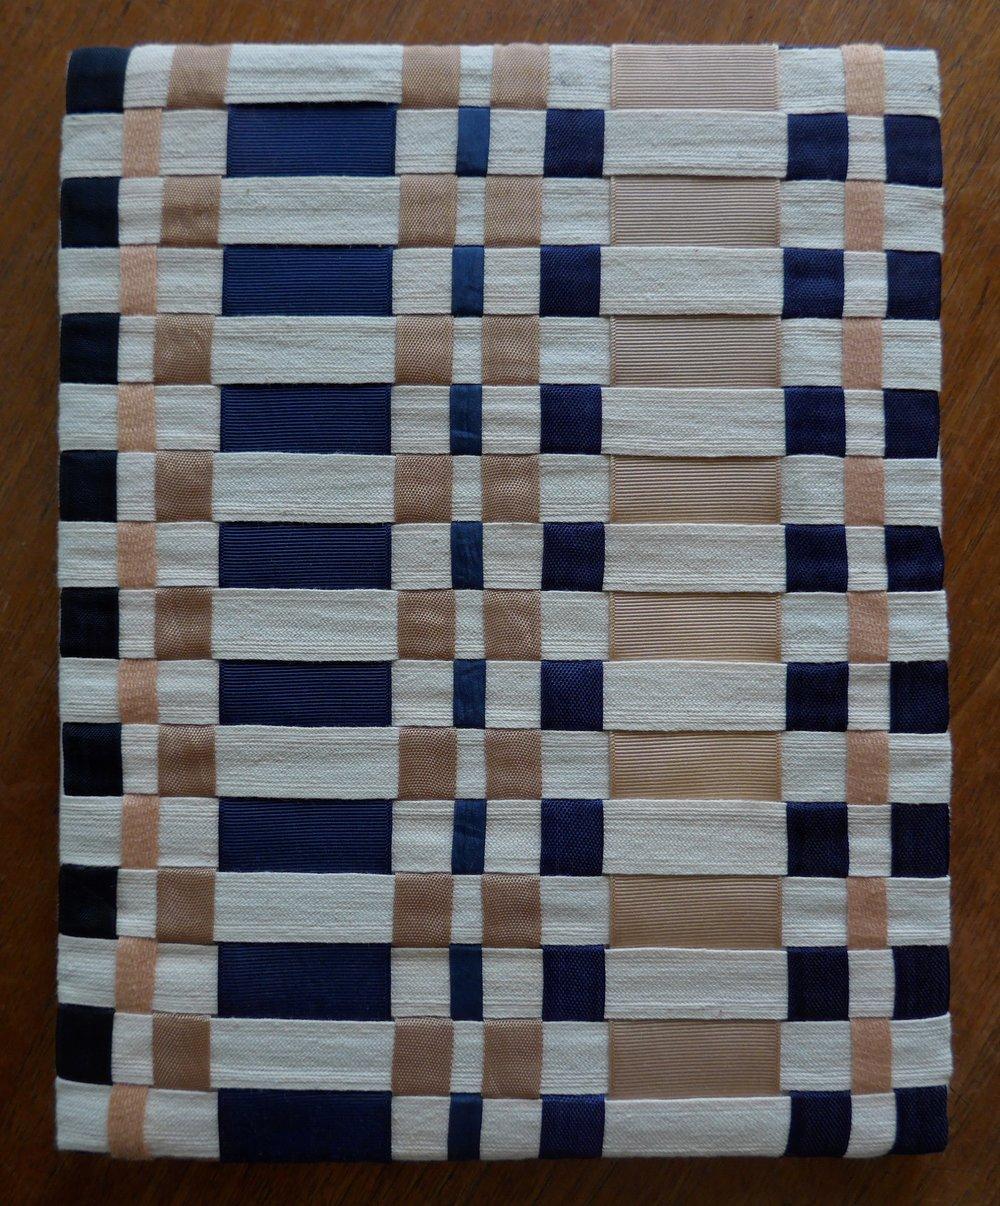 Twill tape, seam binding, middy braid, grosgrain ribbon, 2013.